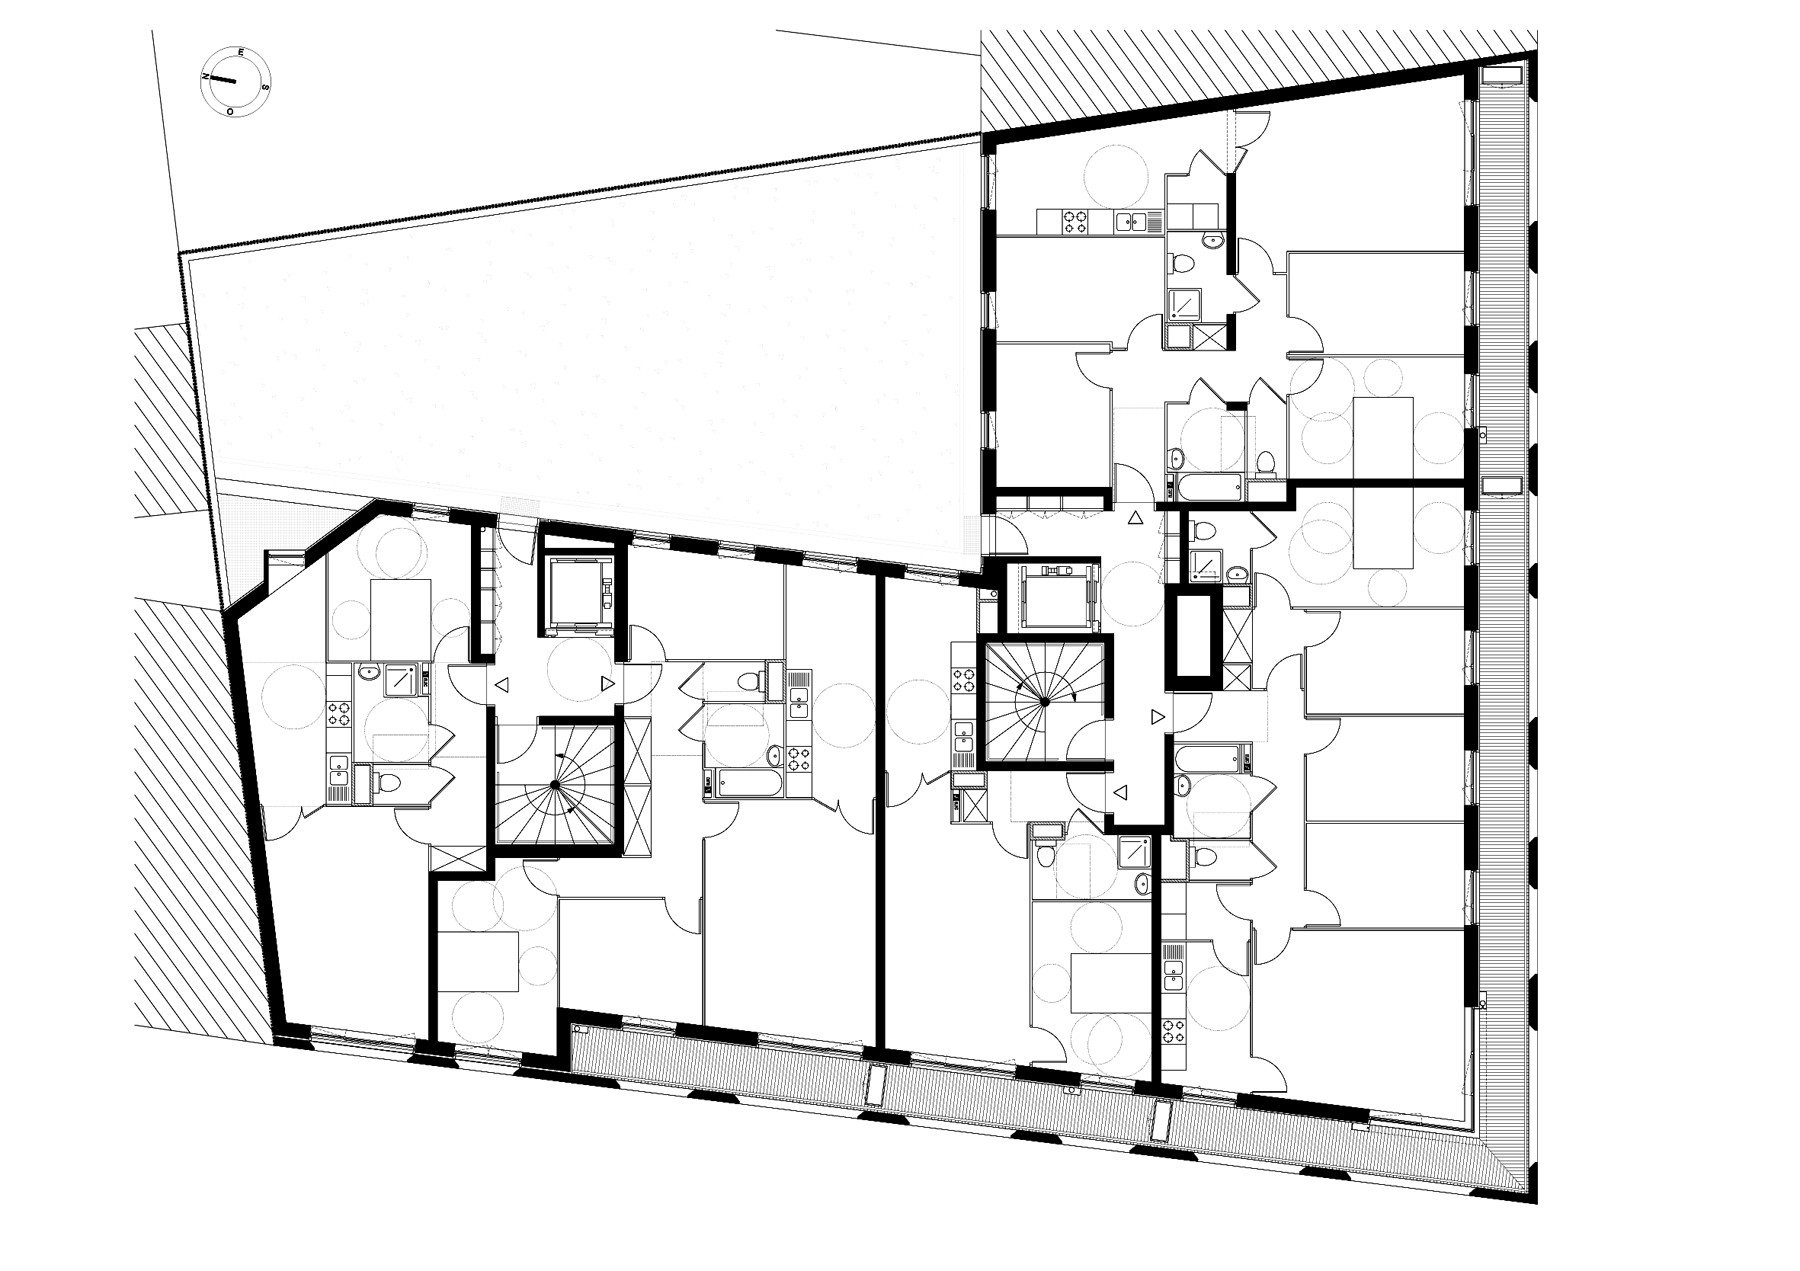 Gallery of social housing units in saint denis atelier for Atelier du jardin d acclimatation